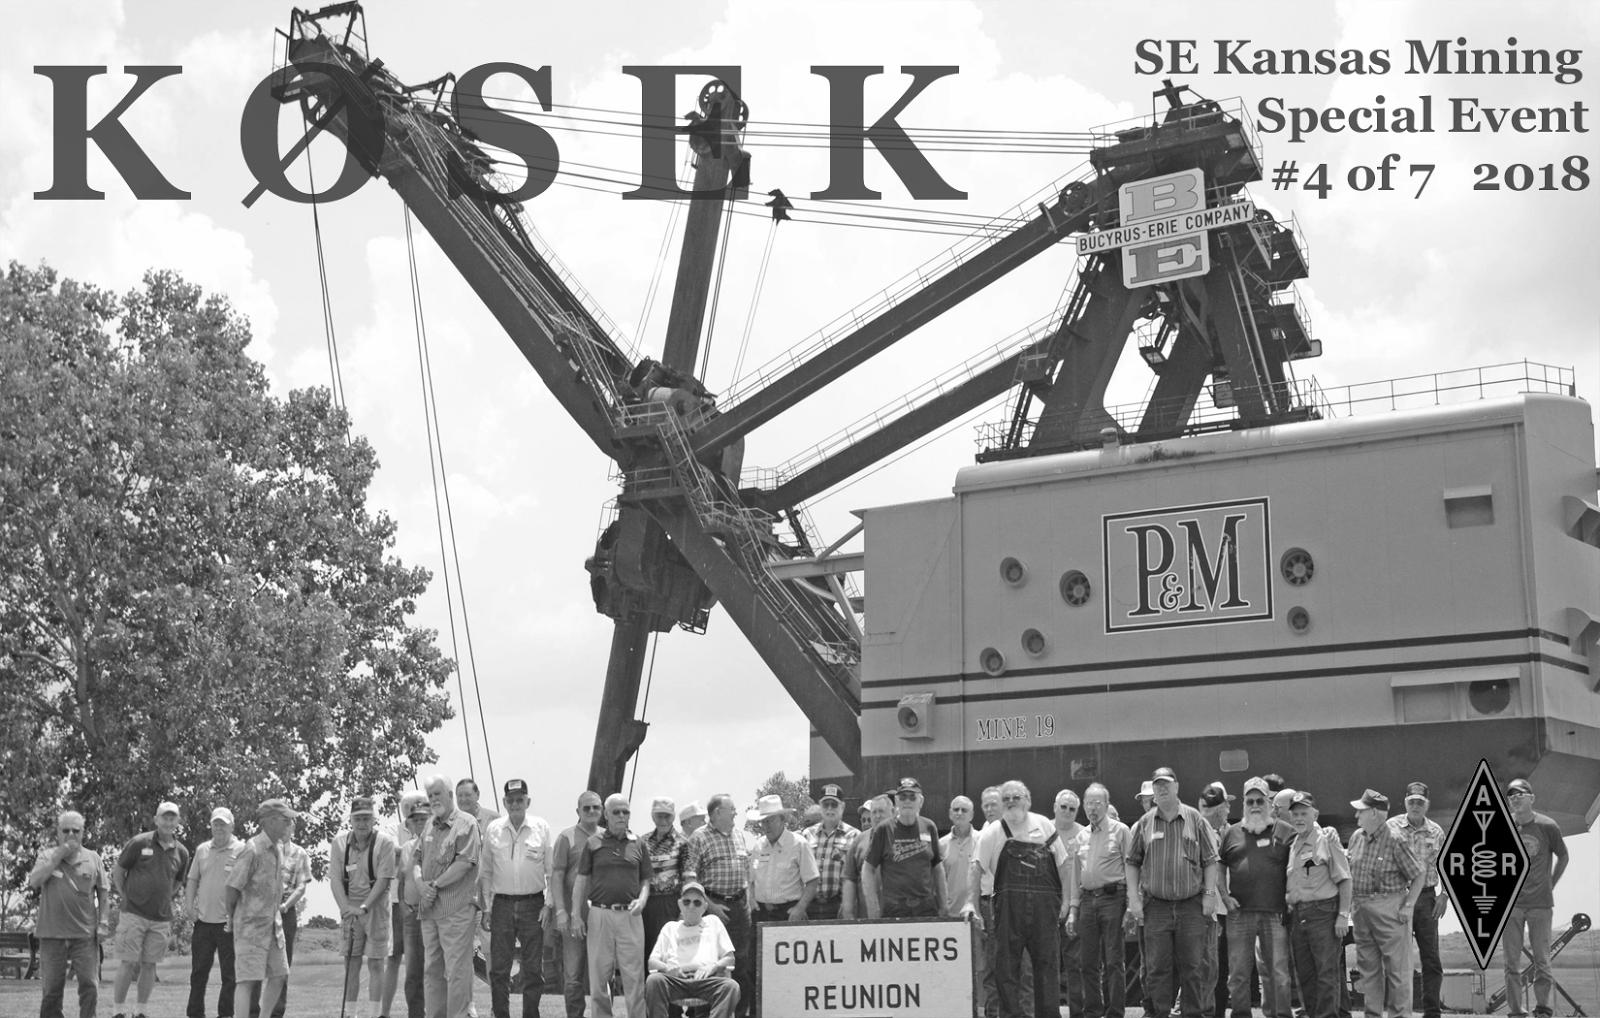 Southeast Kansas Amateur Radio Club: SEK MINING HISTORY SPECIAL ...